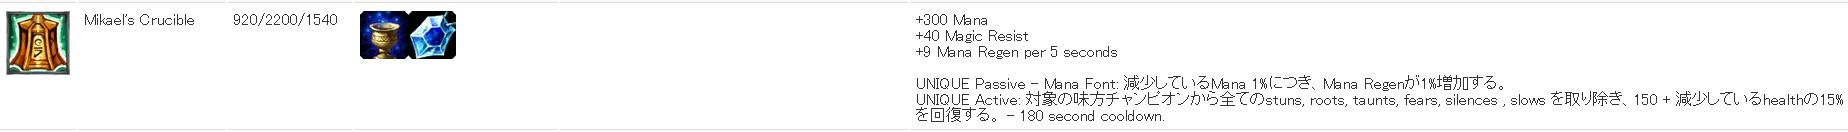 item22.jpg